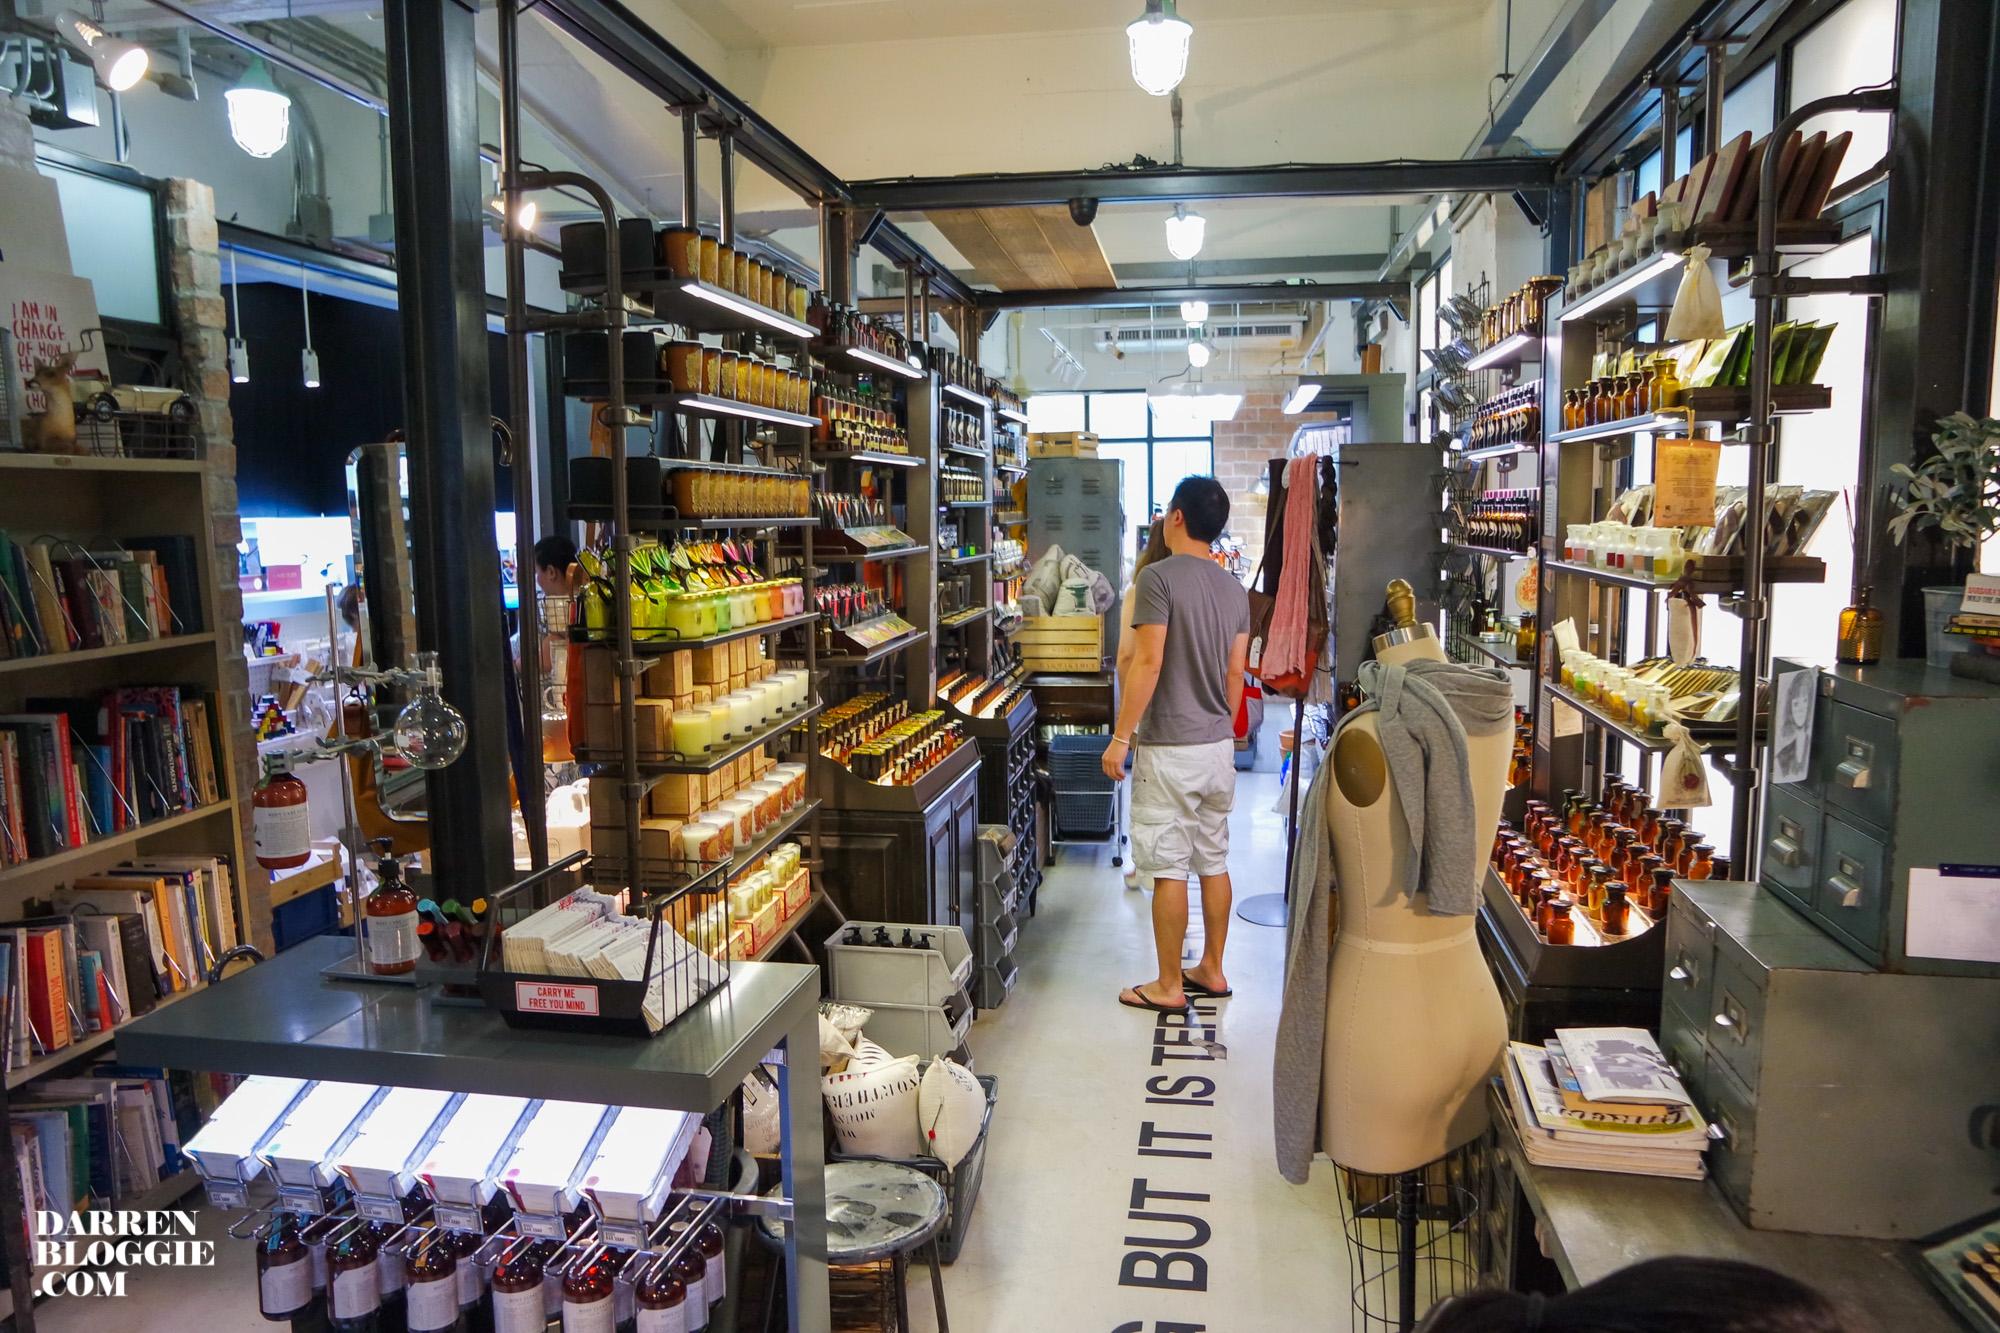 everyday-karmakamet-bangkok-9541